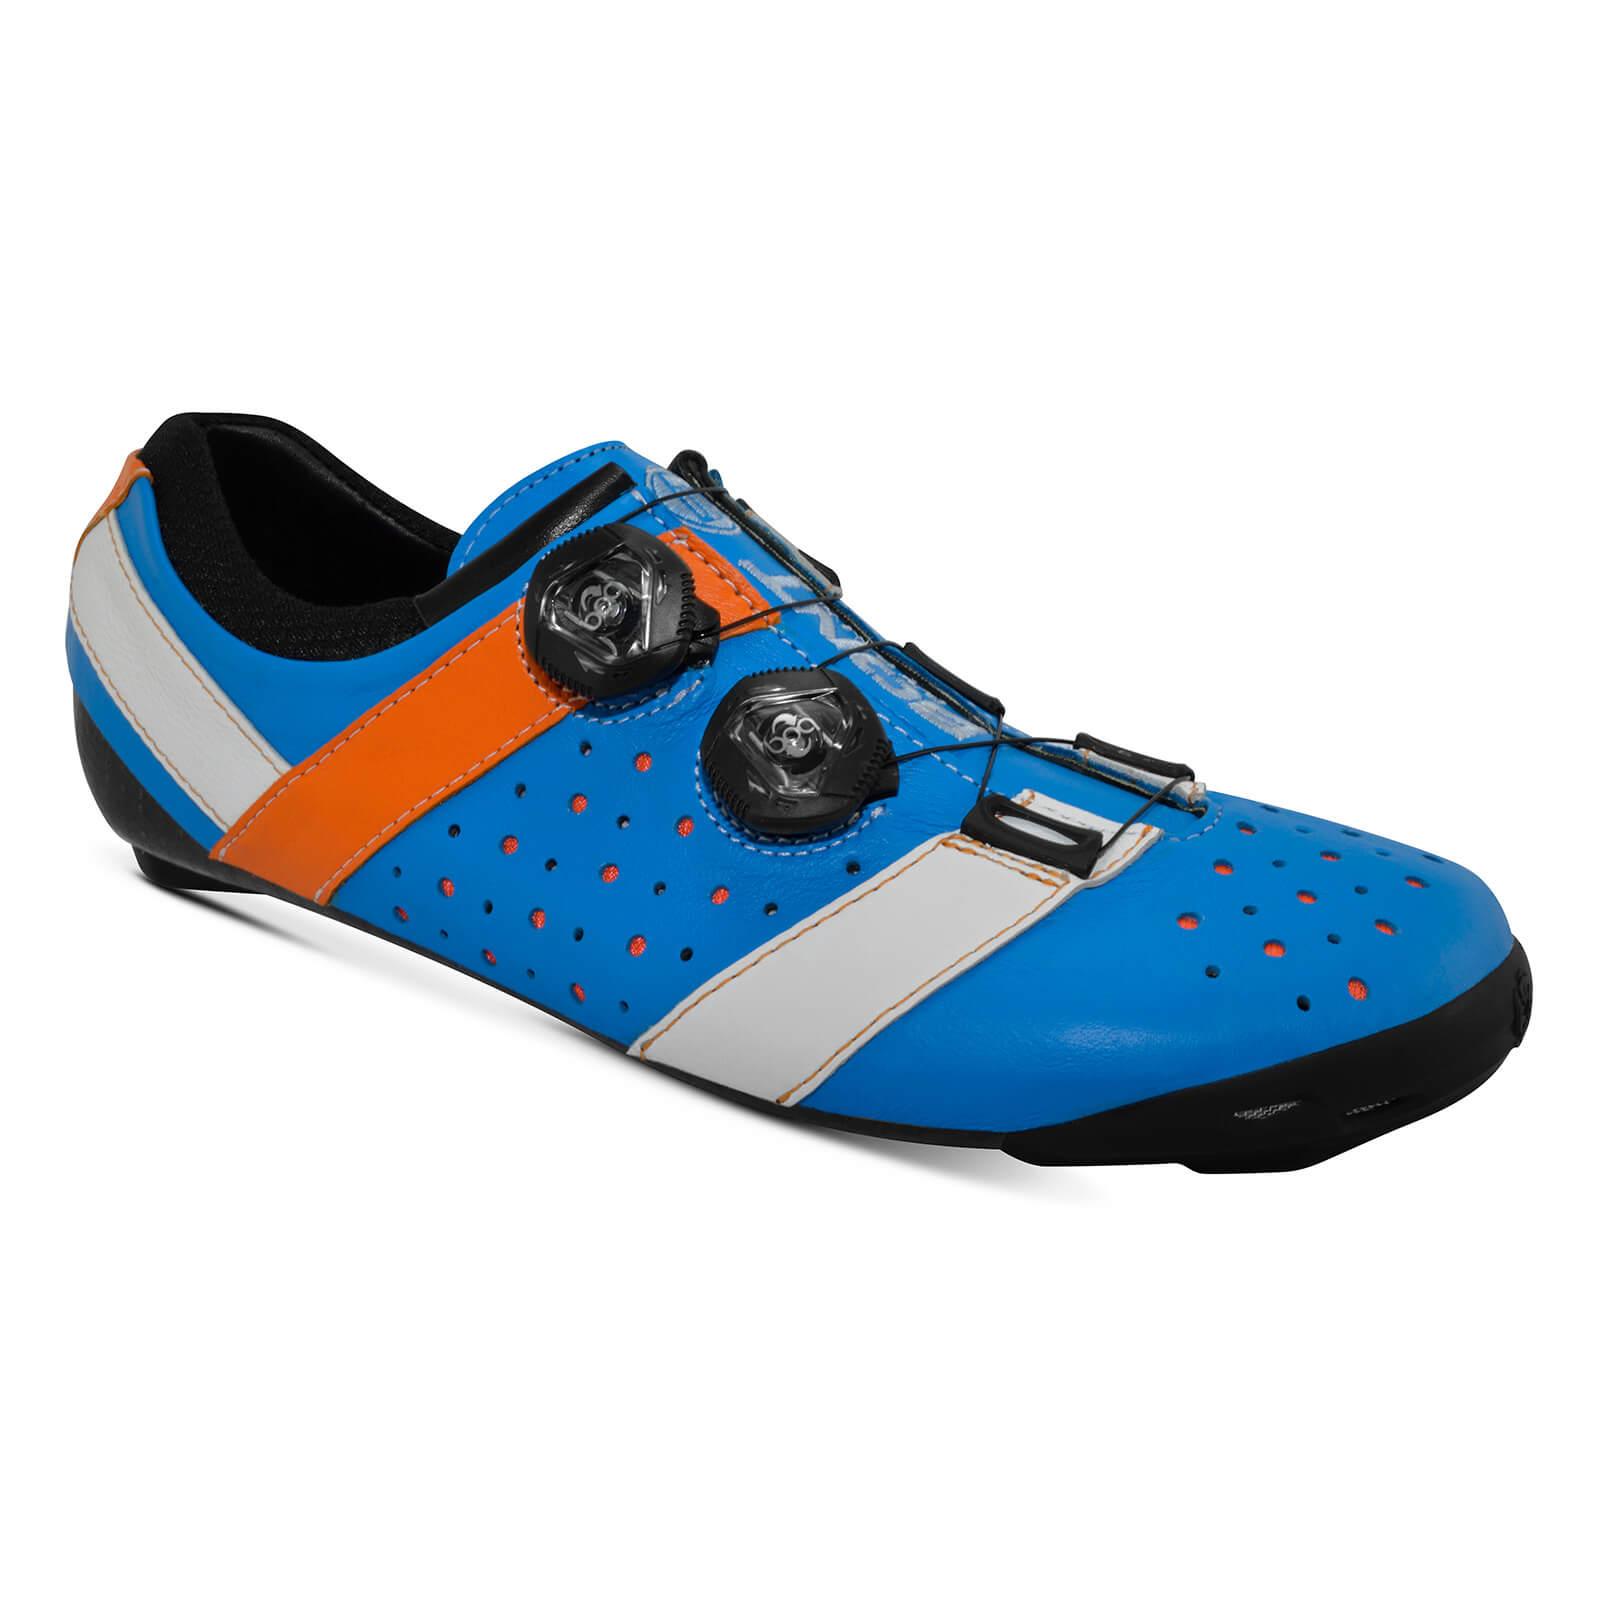 Bont Vaypor + Road Shoes - EU 41 - Normal Fit - Blue/Orange